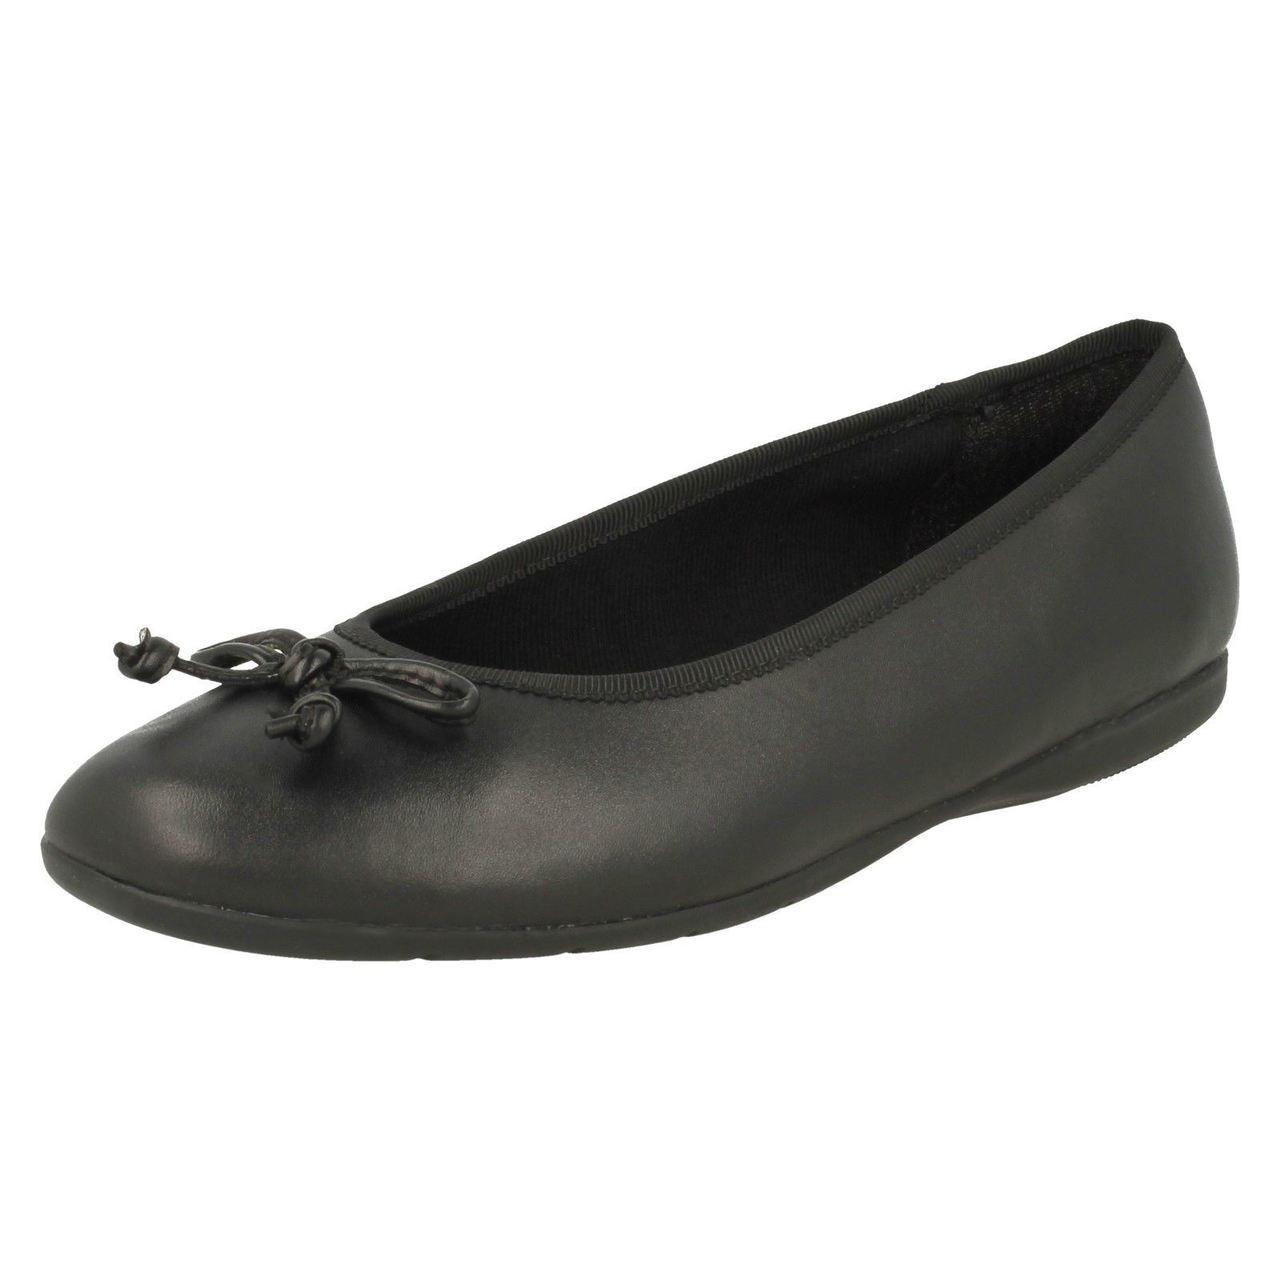 Girls Clarks Slip On Bow School Shoes